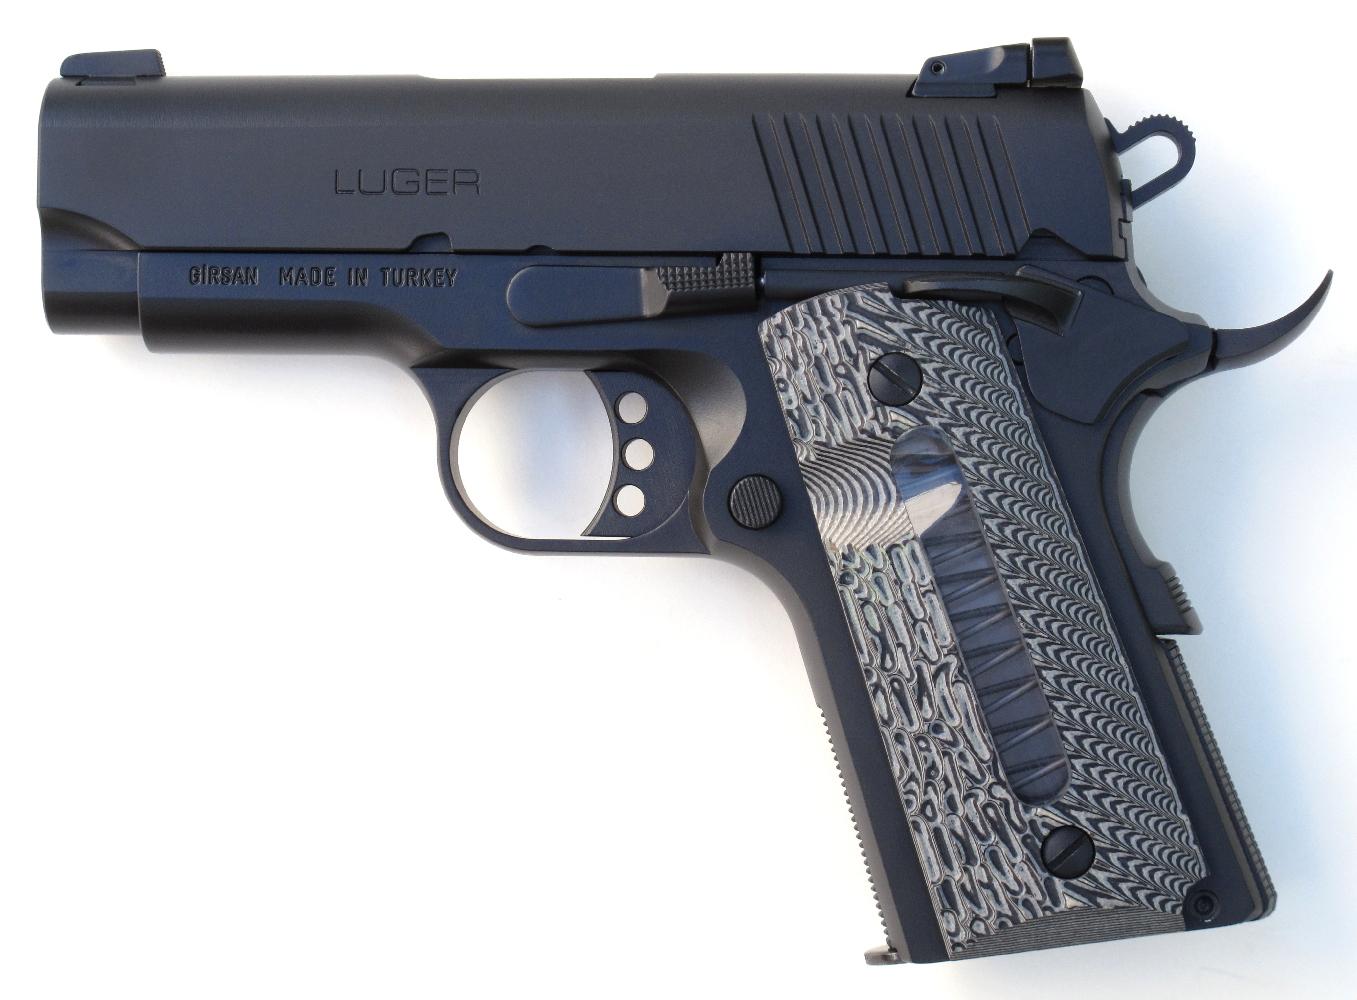 Pistolet Luger MC 1911 SC en calibre .45 ACP